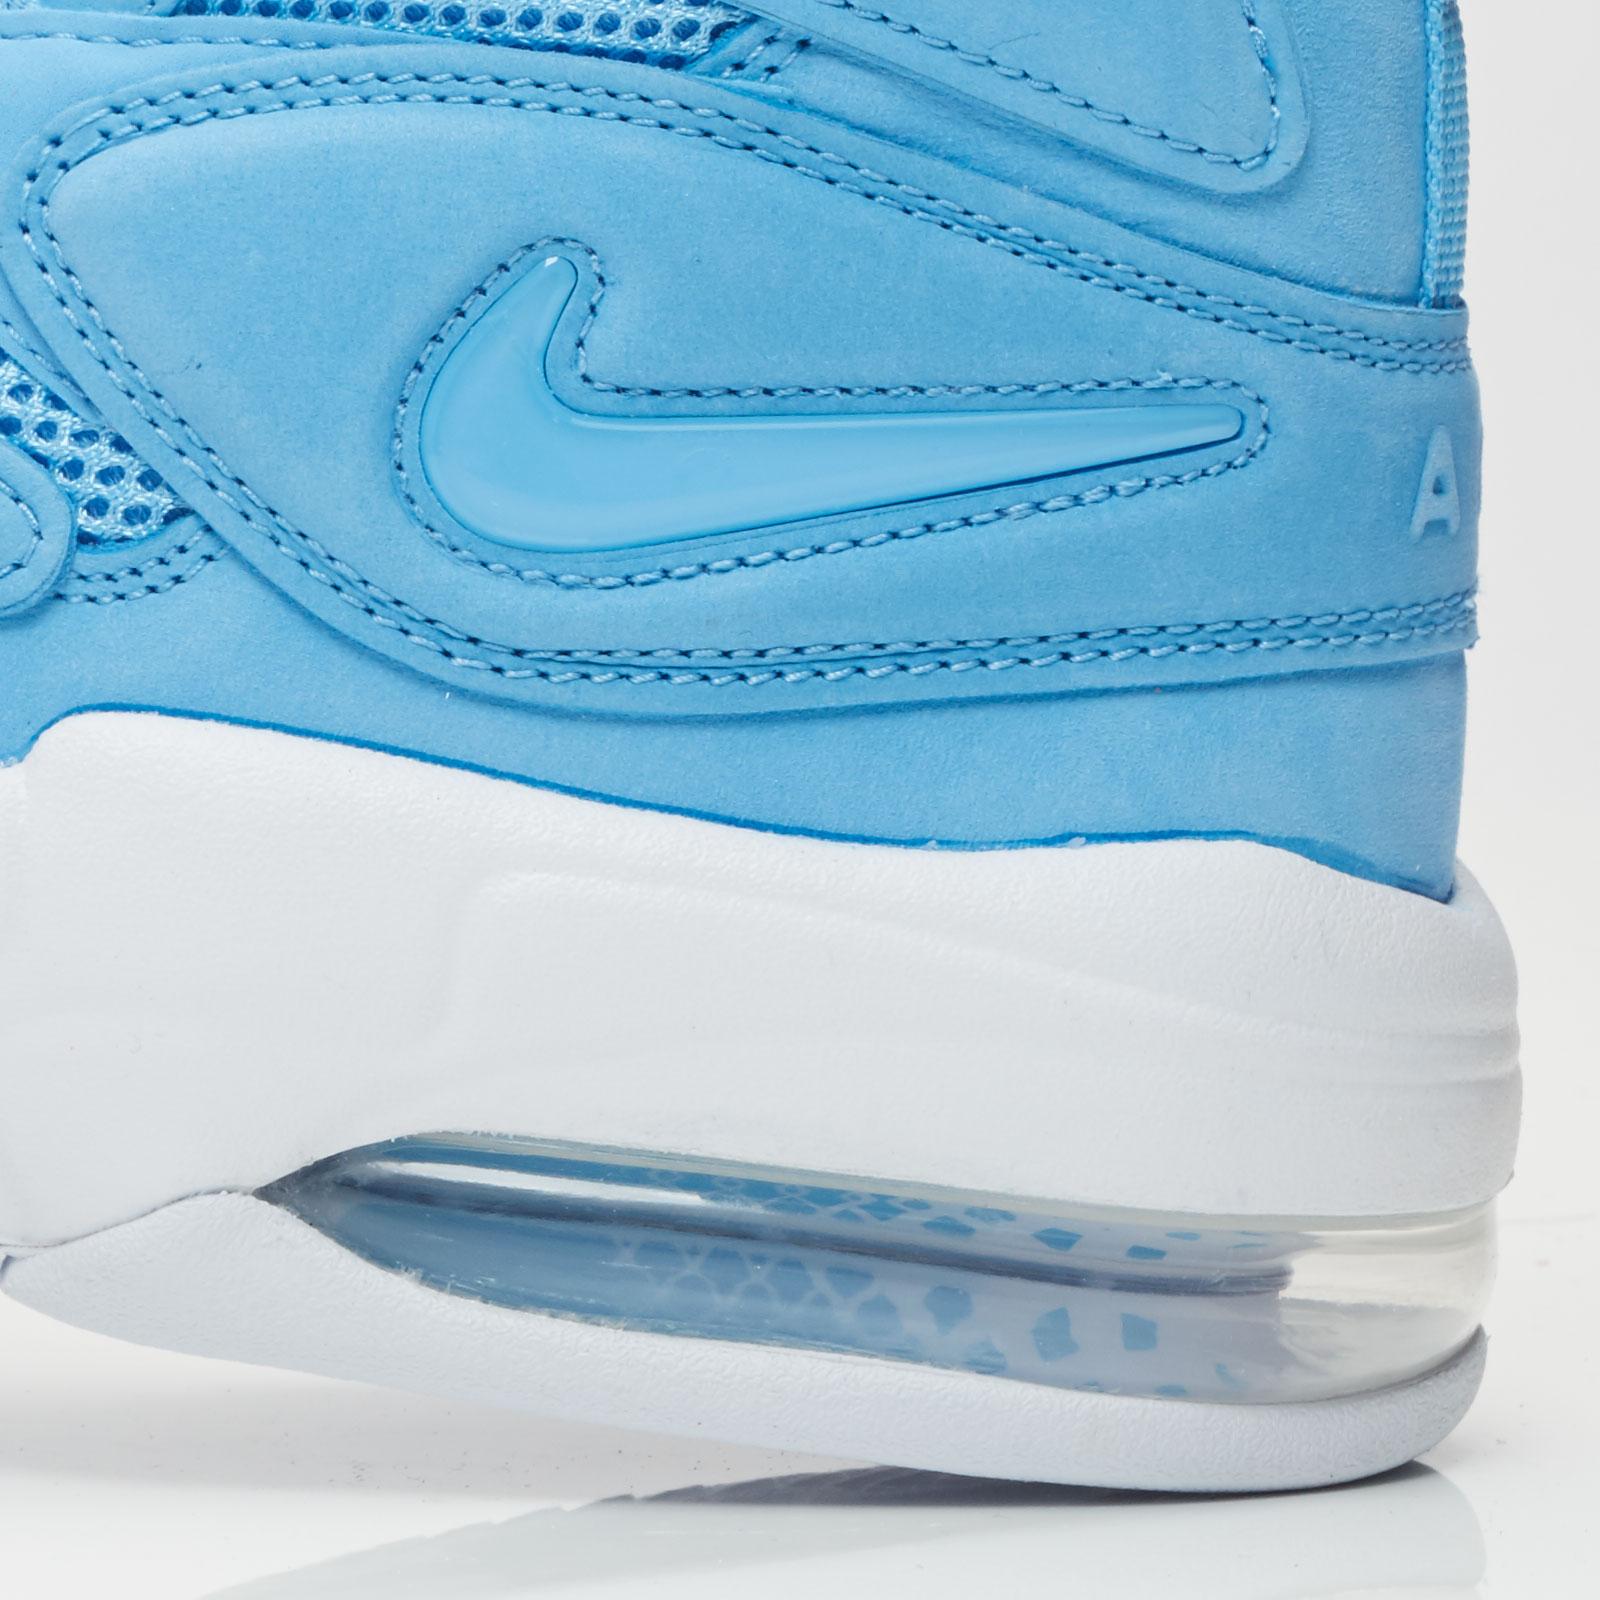 finest selection b1d5e bb6f4 ... Nike Sportswear Air Max2 Uptempo 94 As Qs